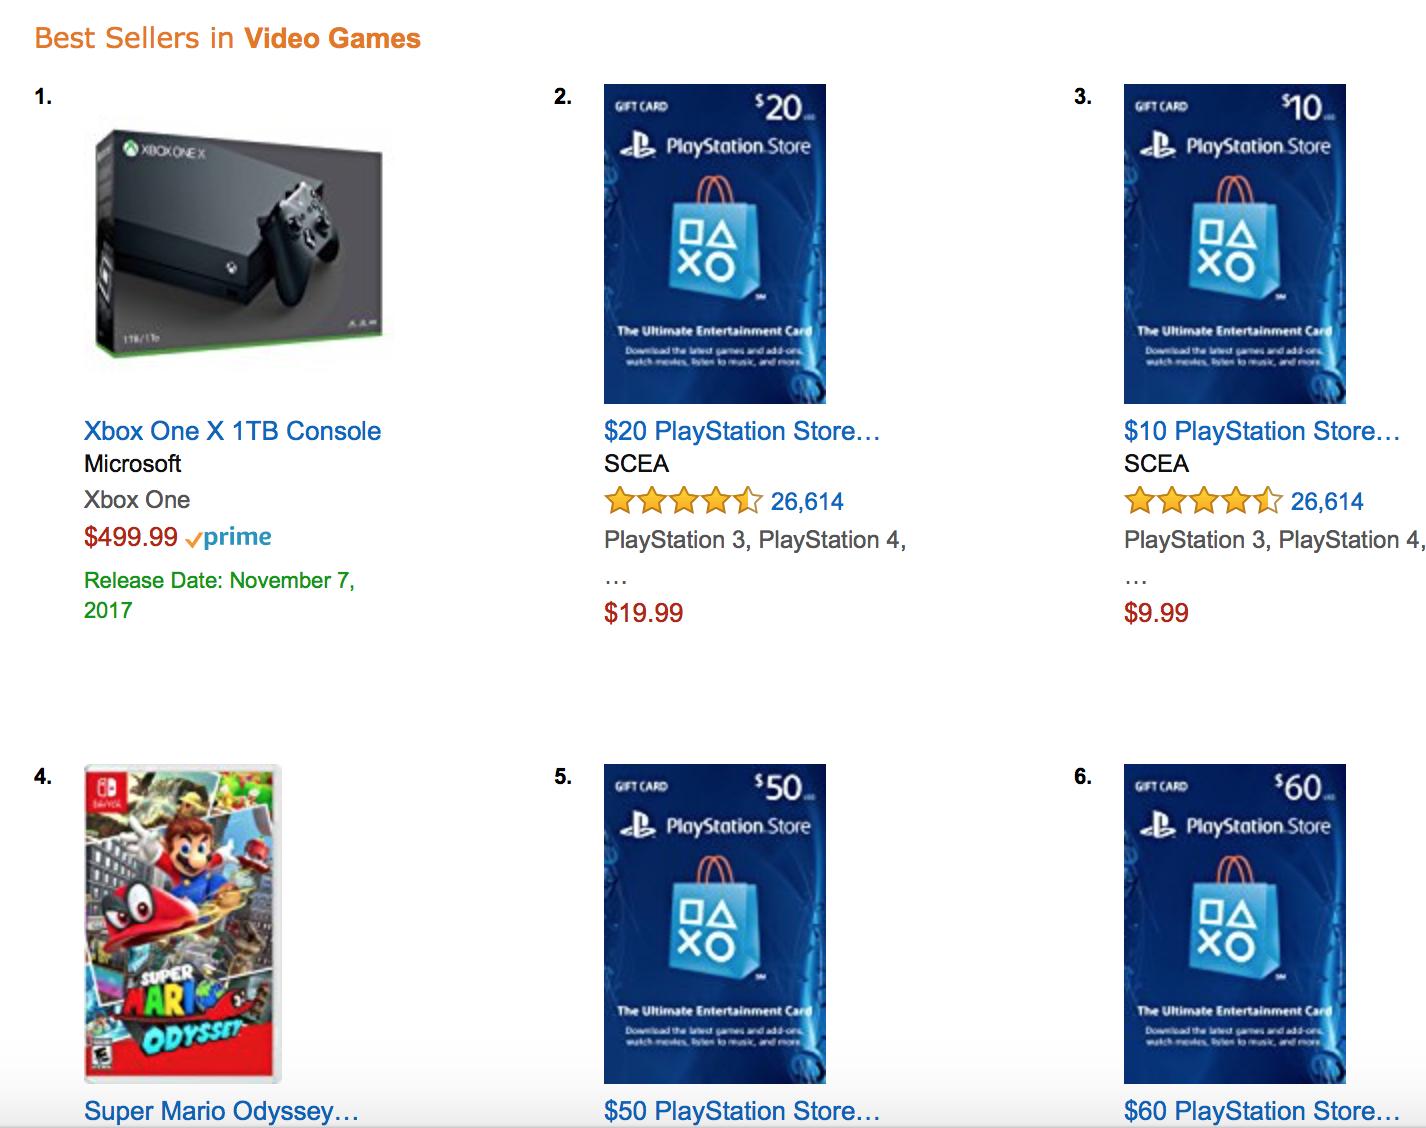 playstation 4 pro limited edition amazon